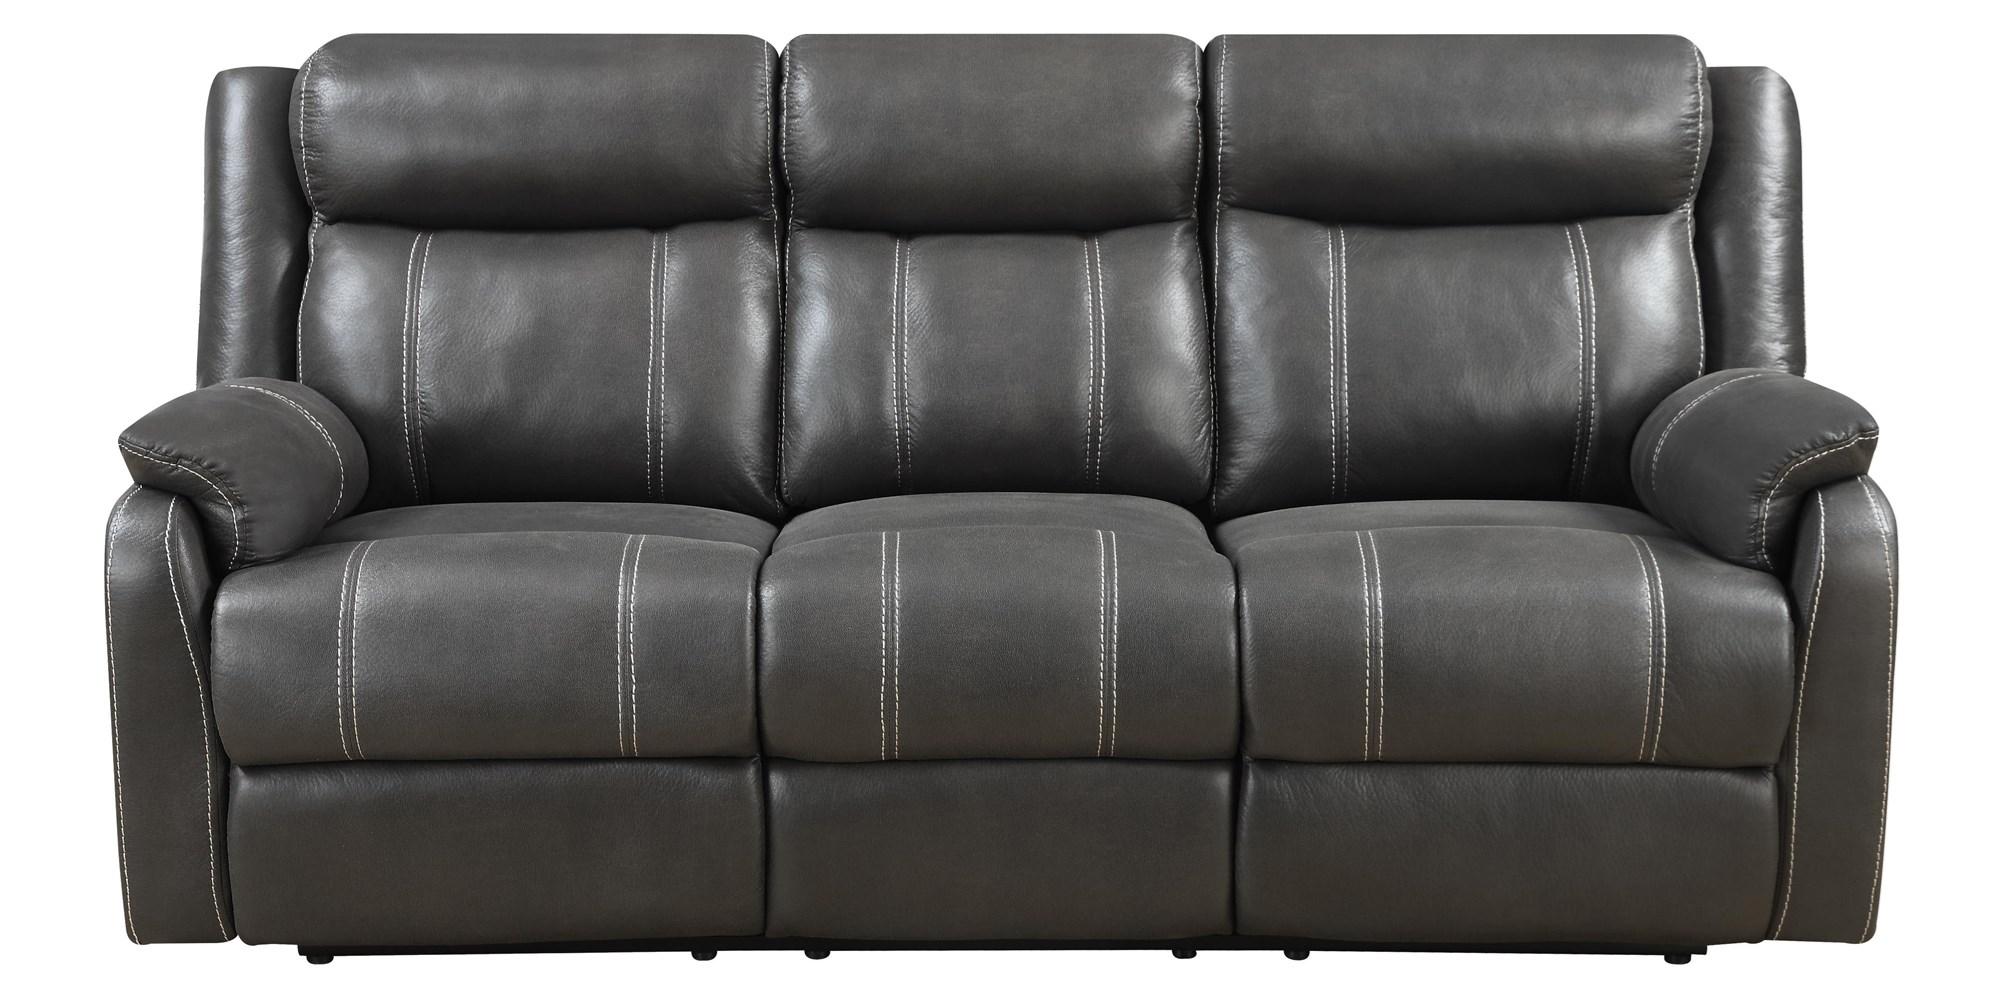 Domino Black Sofa